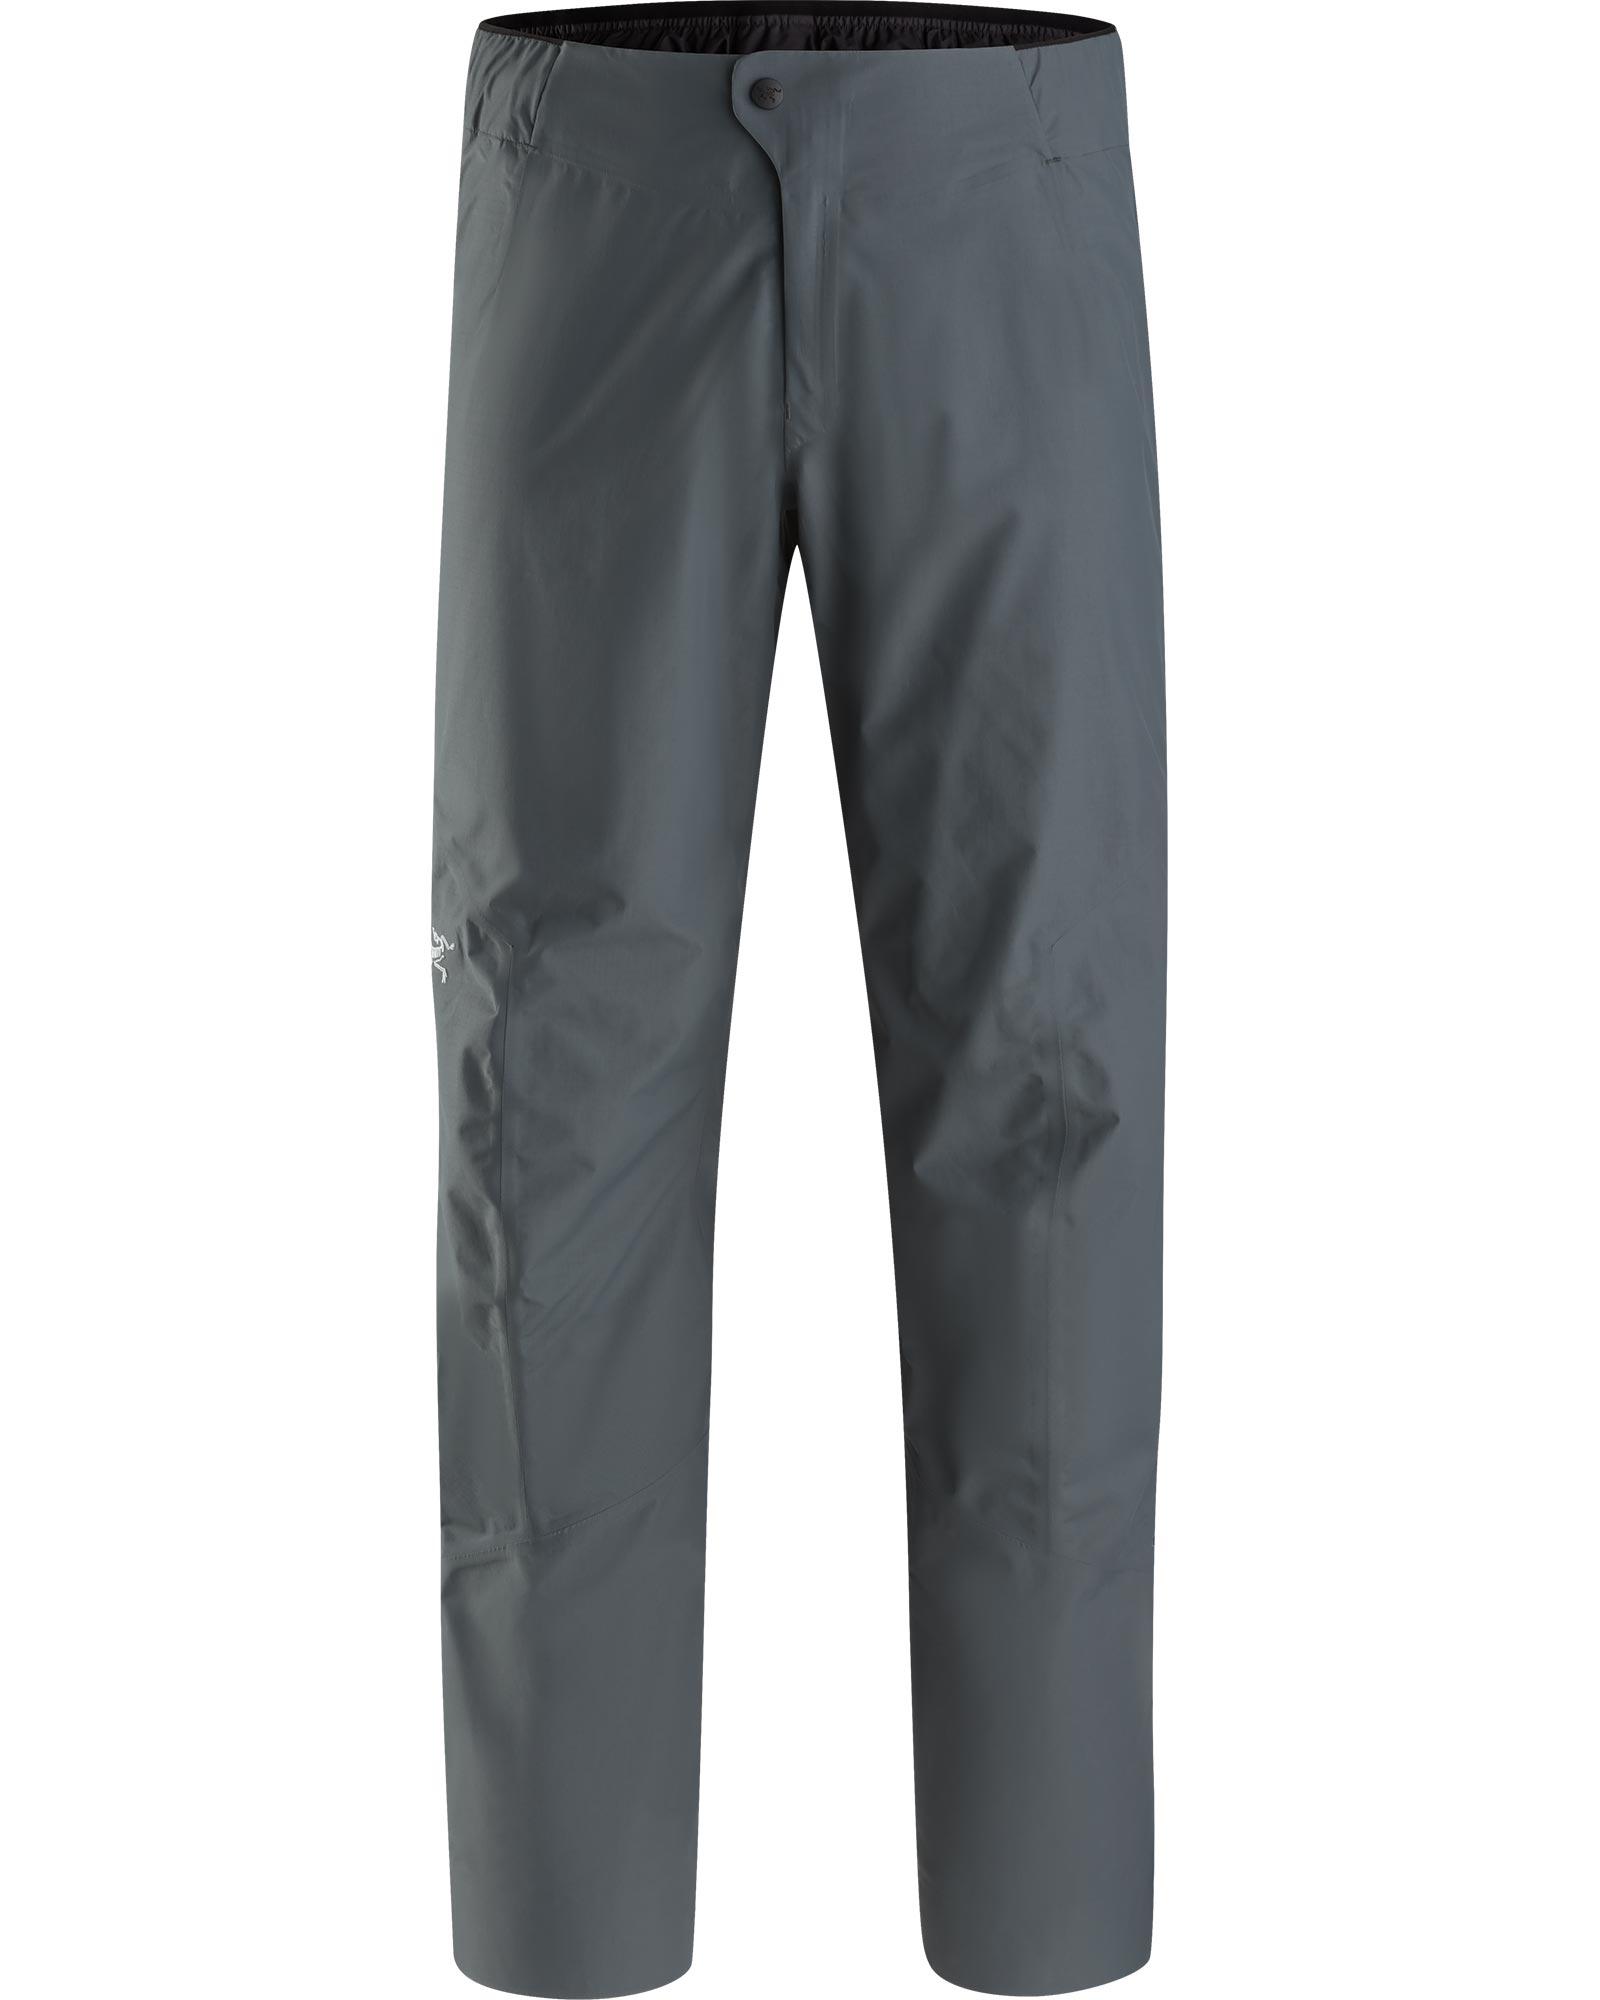 Arc'teryx Zeta SL GORE-TEX PACLITE Plus Men's Pants 0